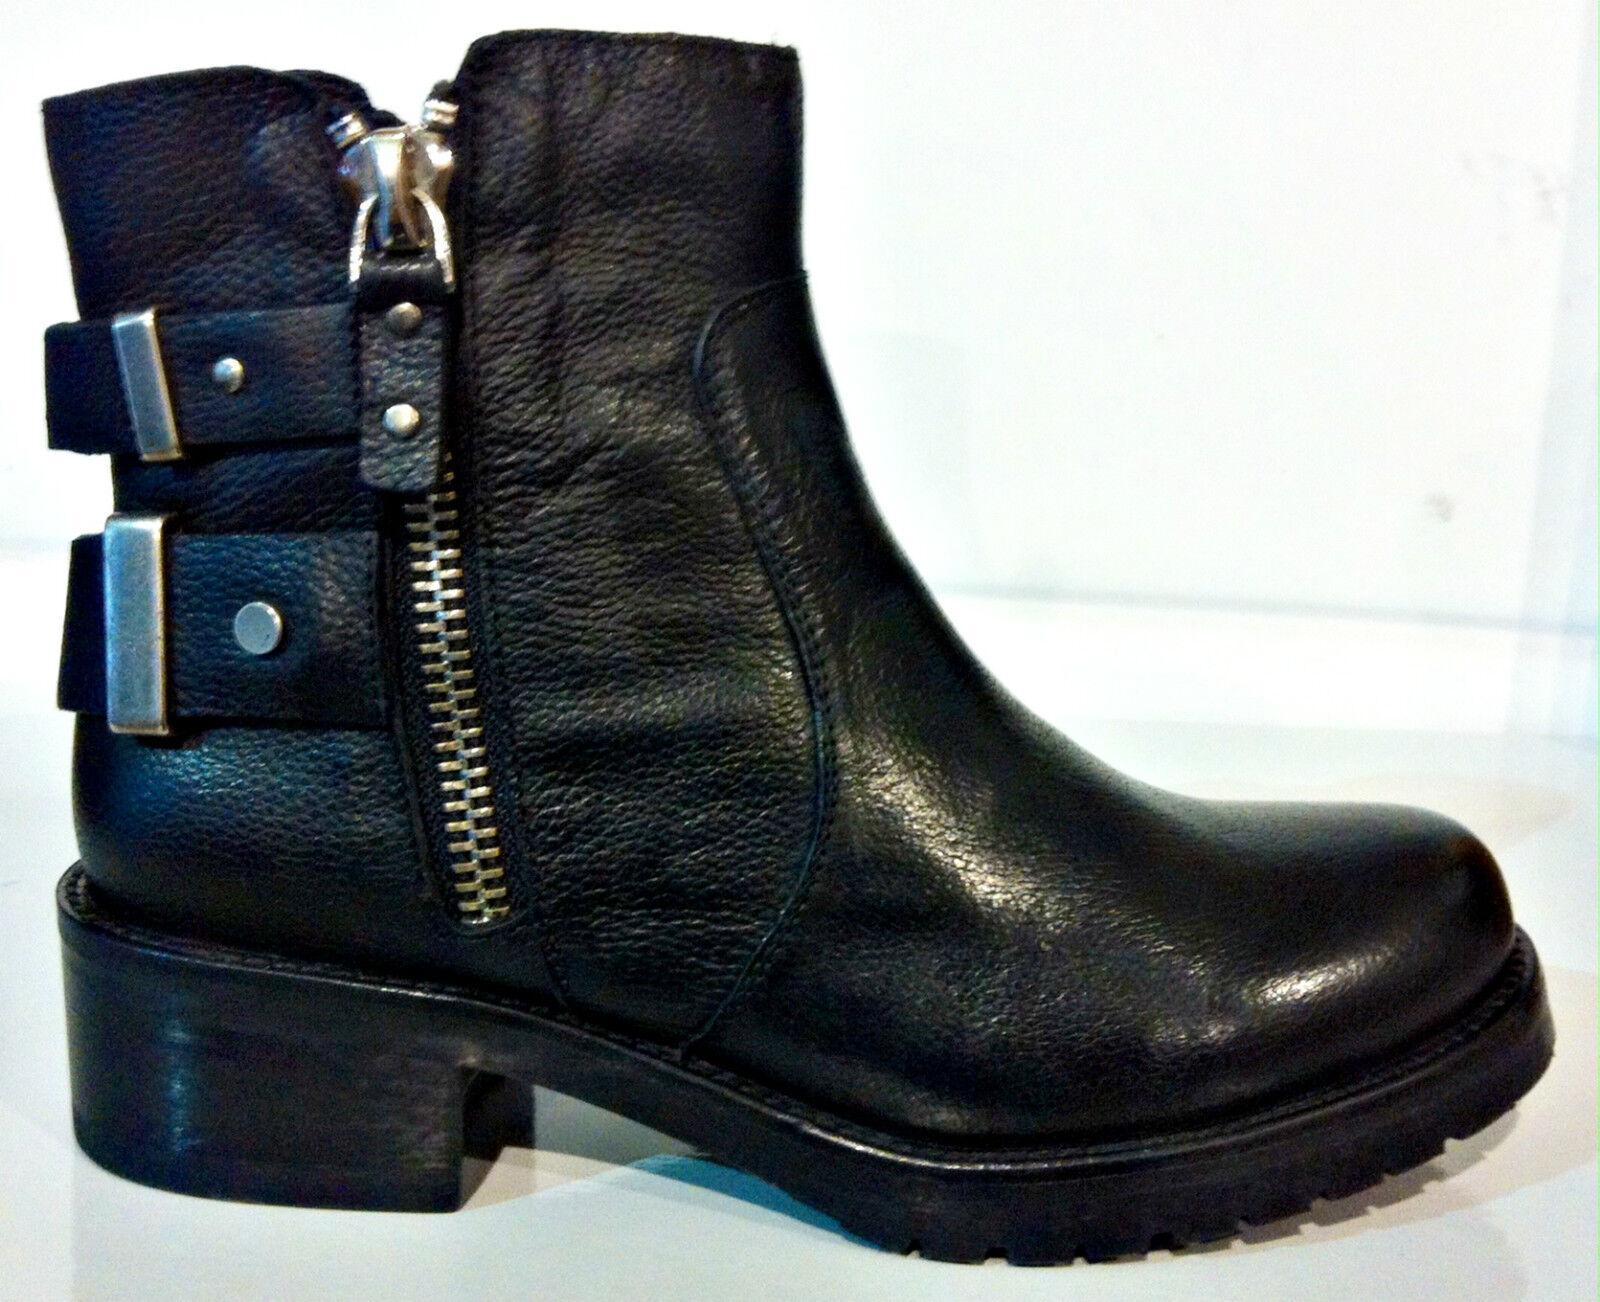 vivien lee 5811C schwarz Stiefel niedrig Damenschuhe Leder Bbsatz Keilabsätze